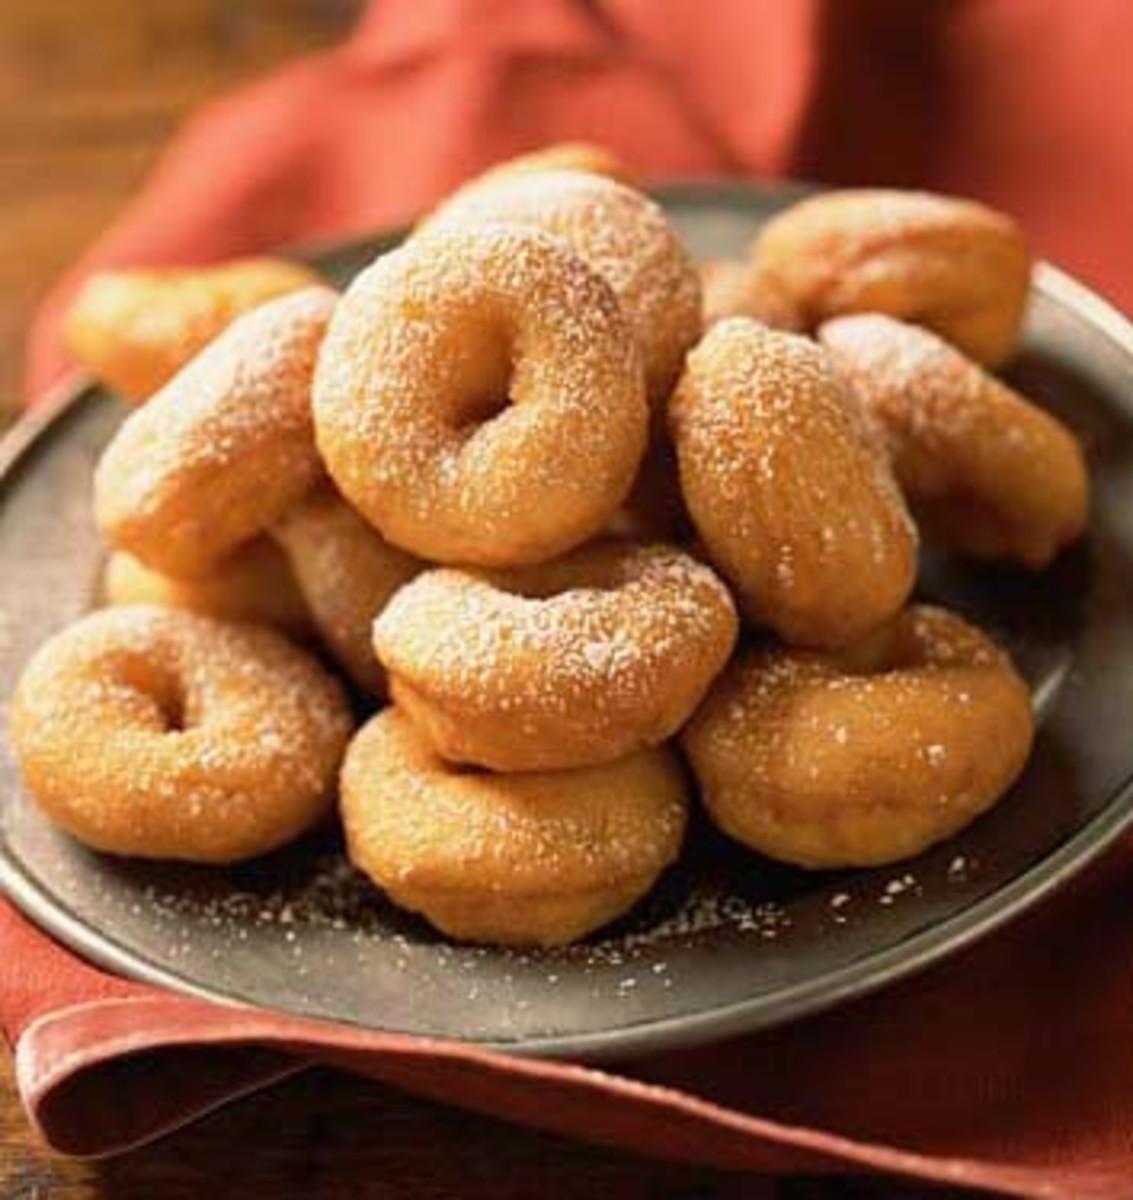 Delicious apple cider donuts